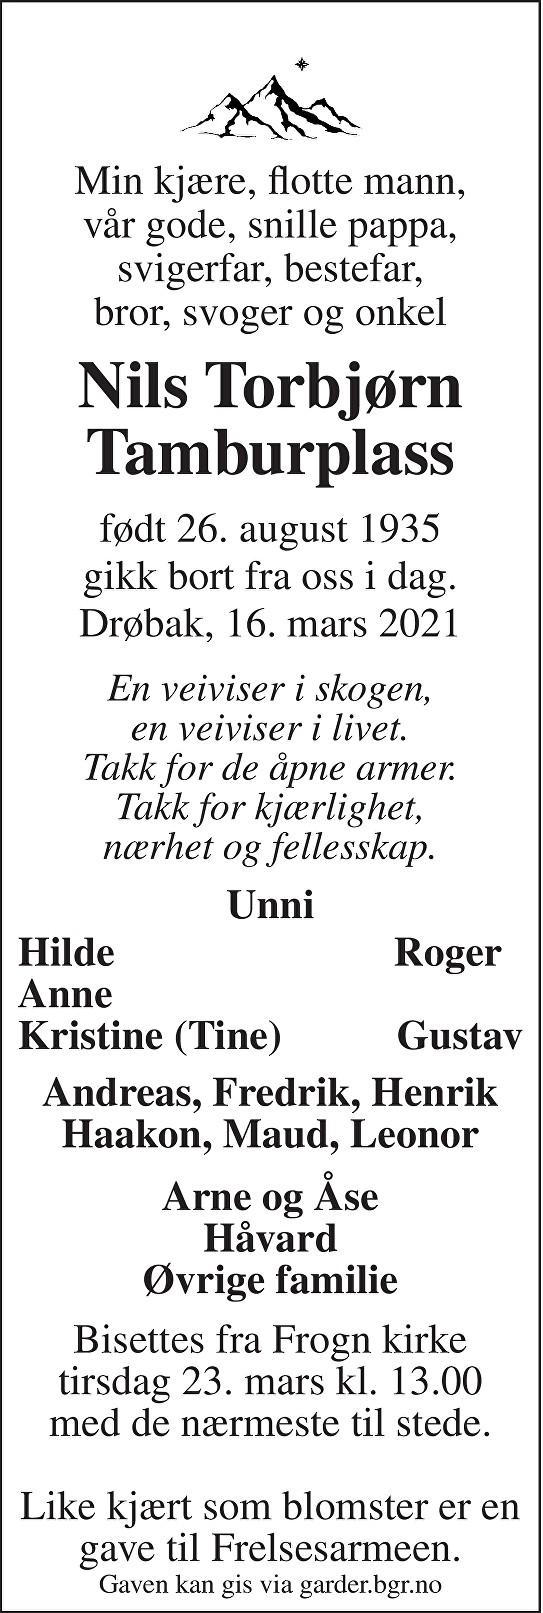 Nils Torbjørn Tamburplass Dødsannonse